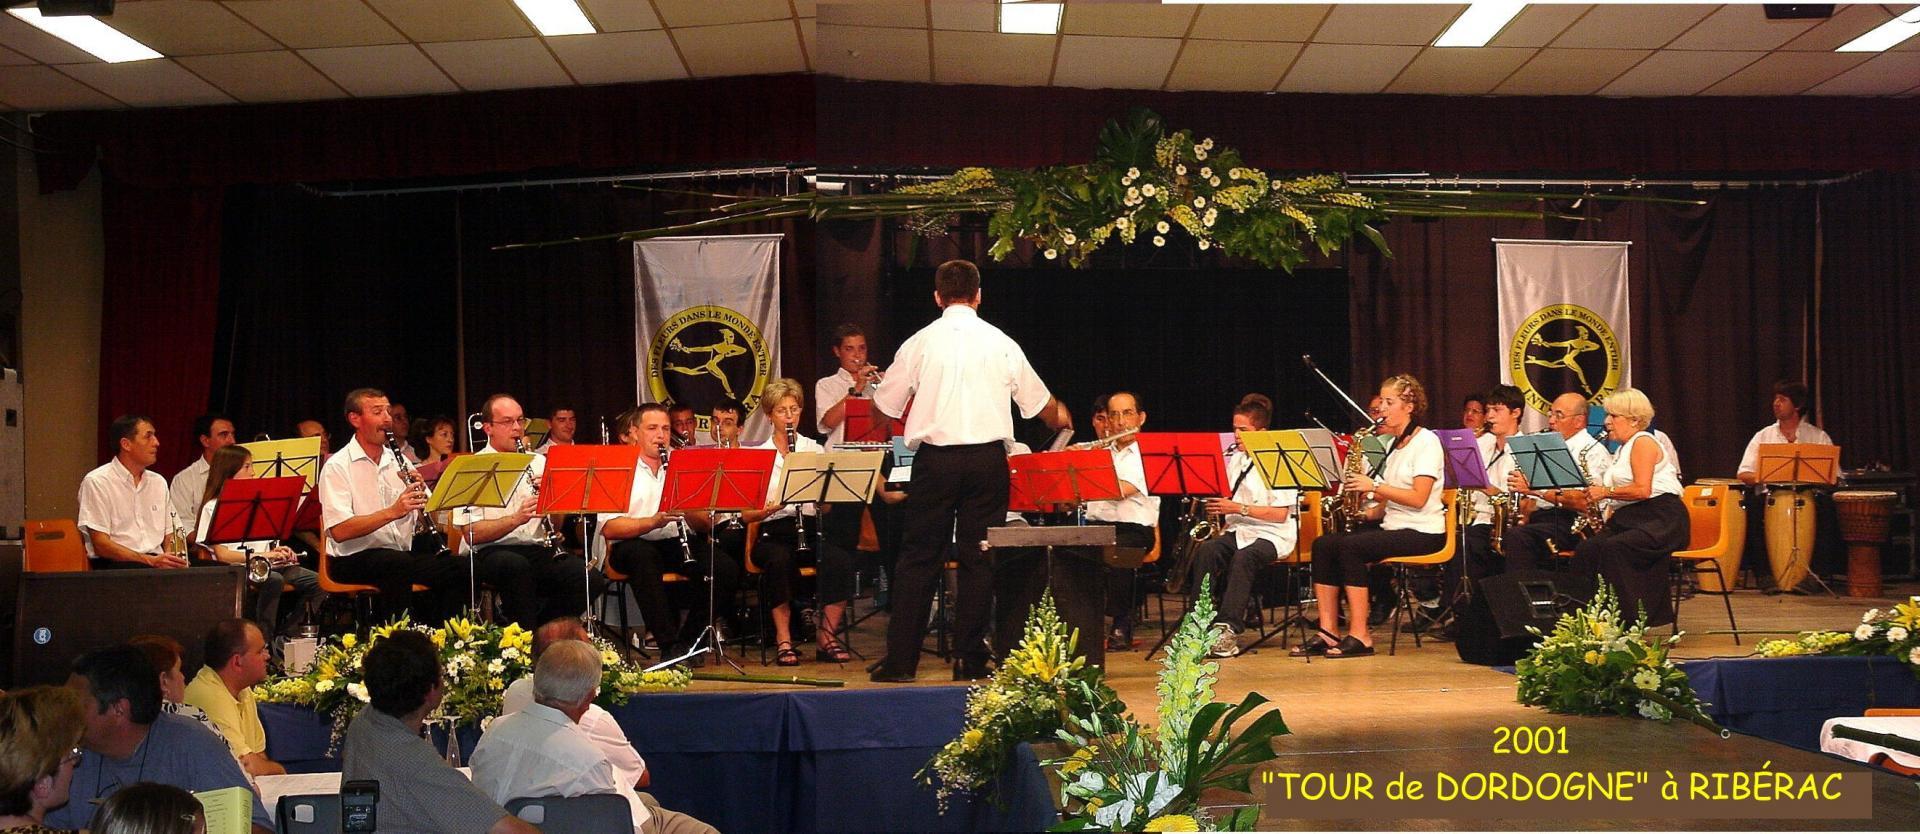 2001 tour dordogne1 1